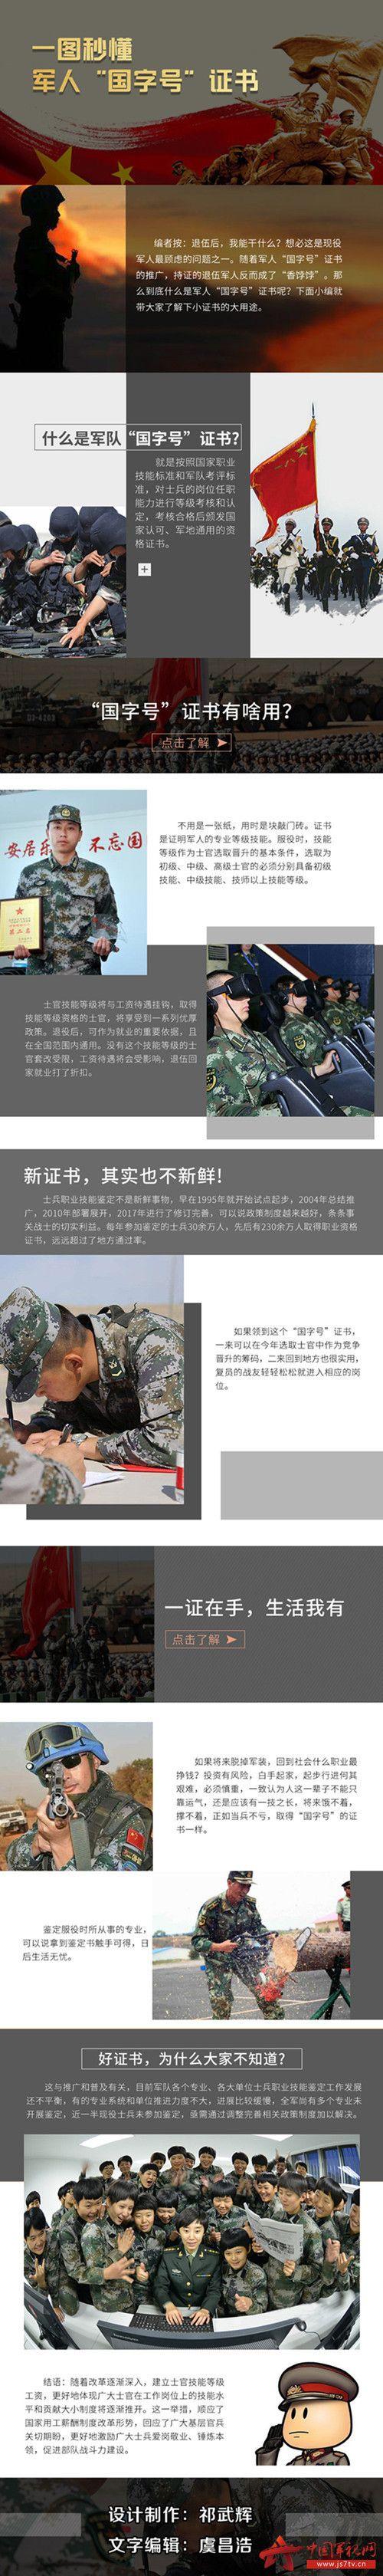 http://files.js7tv.cn/www/images/2018-06/25/1529891705104857_big.jpg